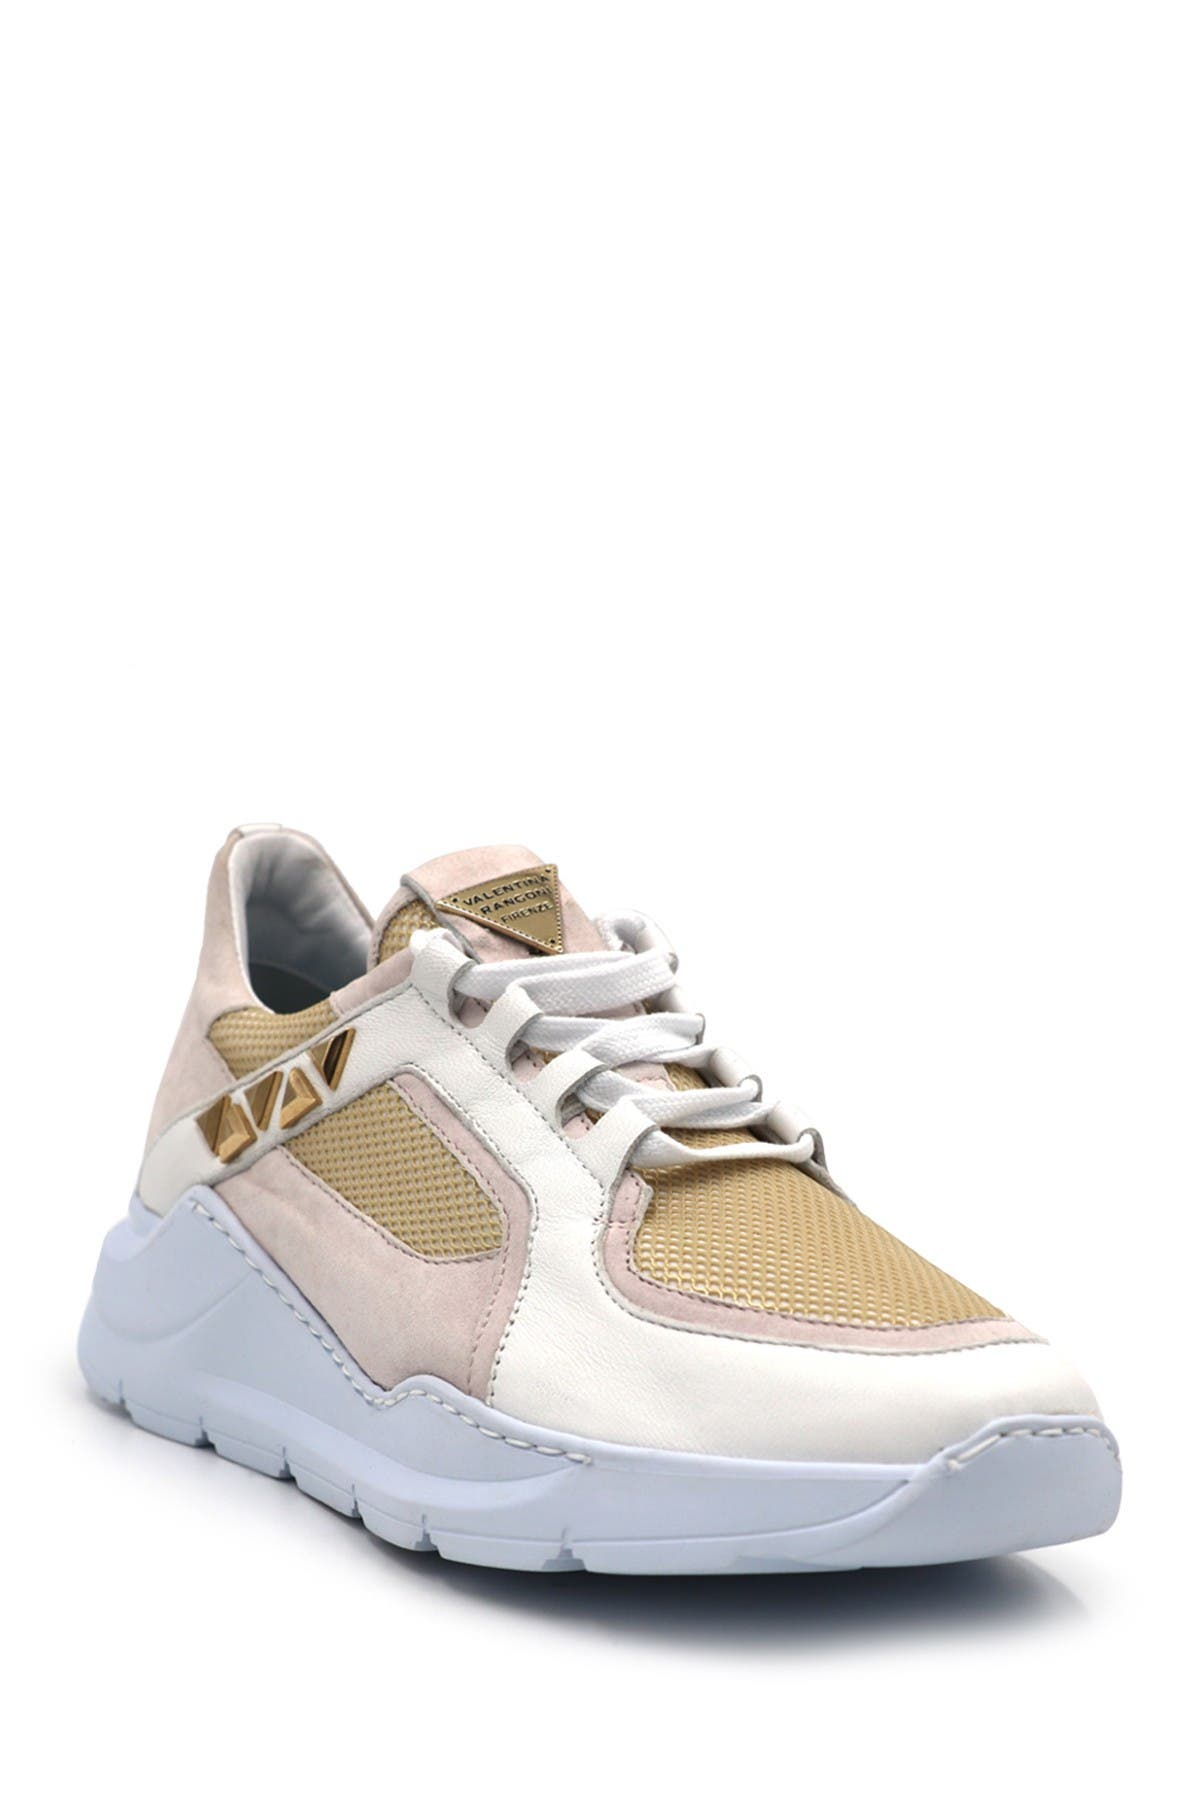 Image of VALENTINA RANGONI Podio Sneaker